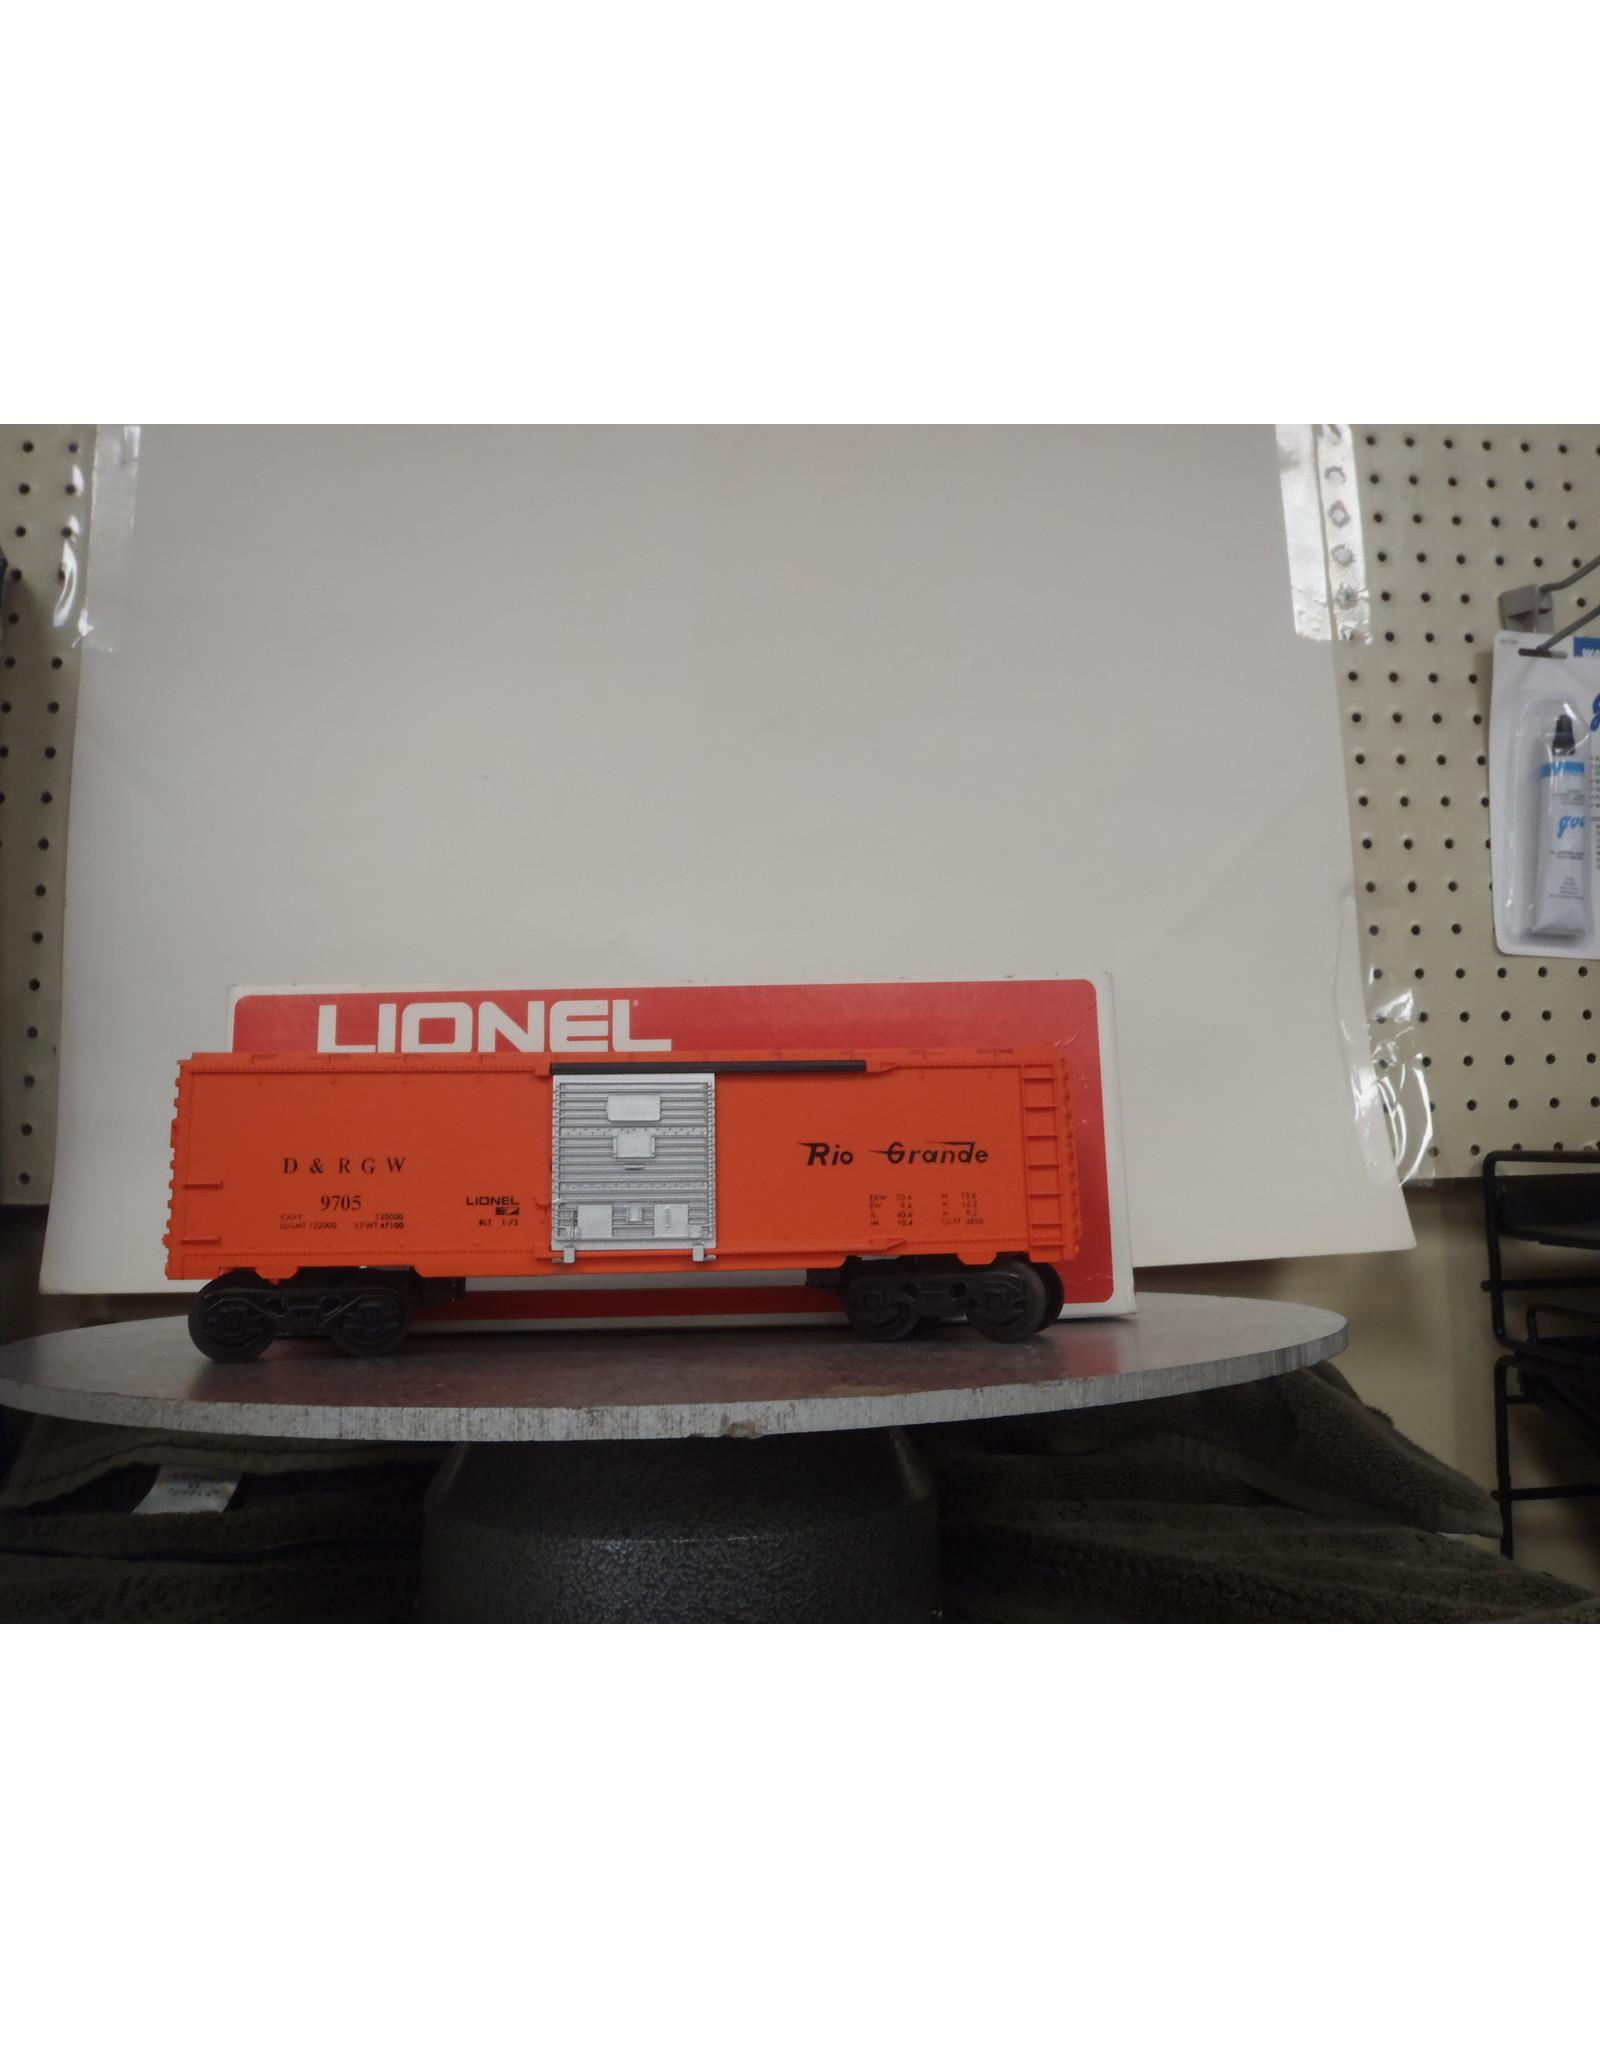 Lionel Boxcar Denver RG 9705